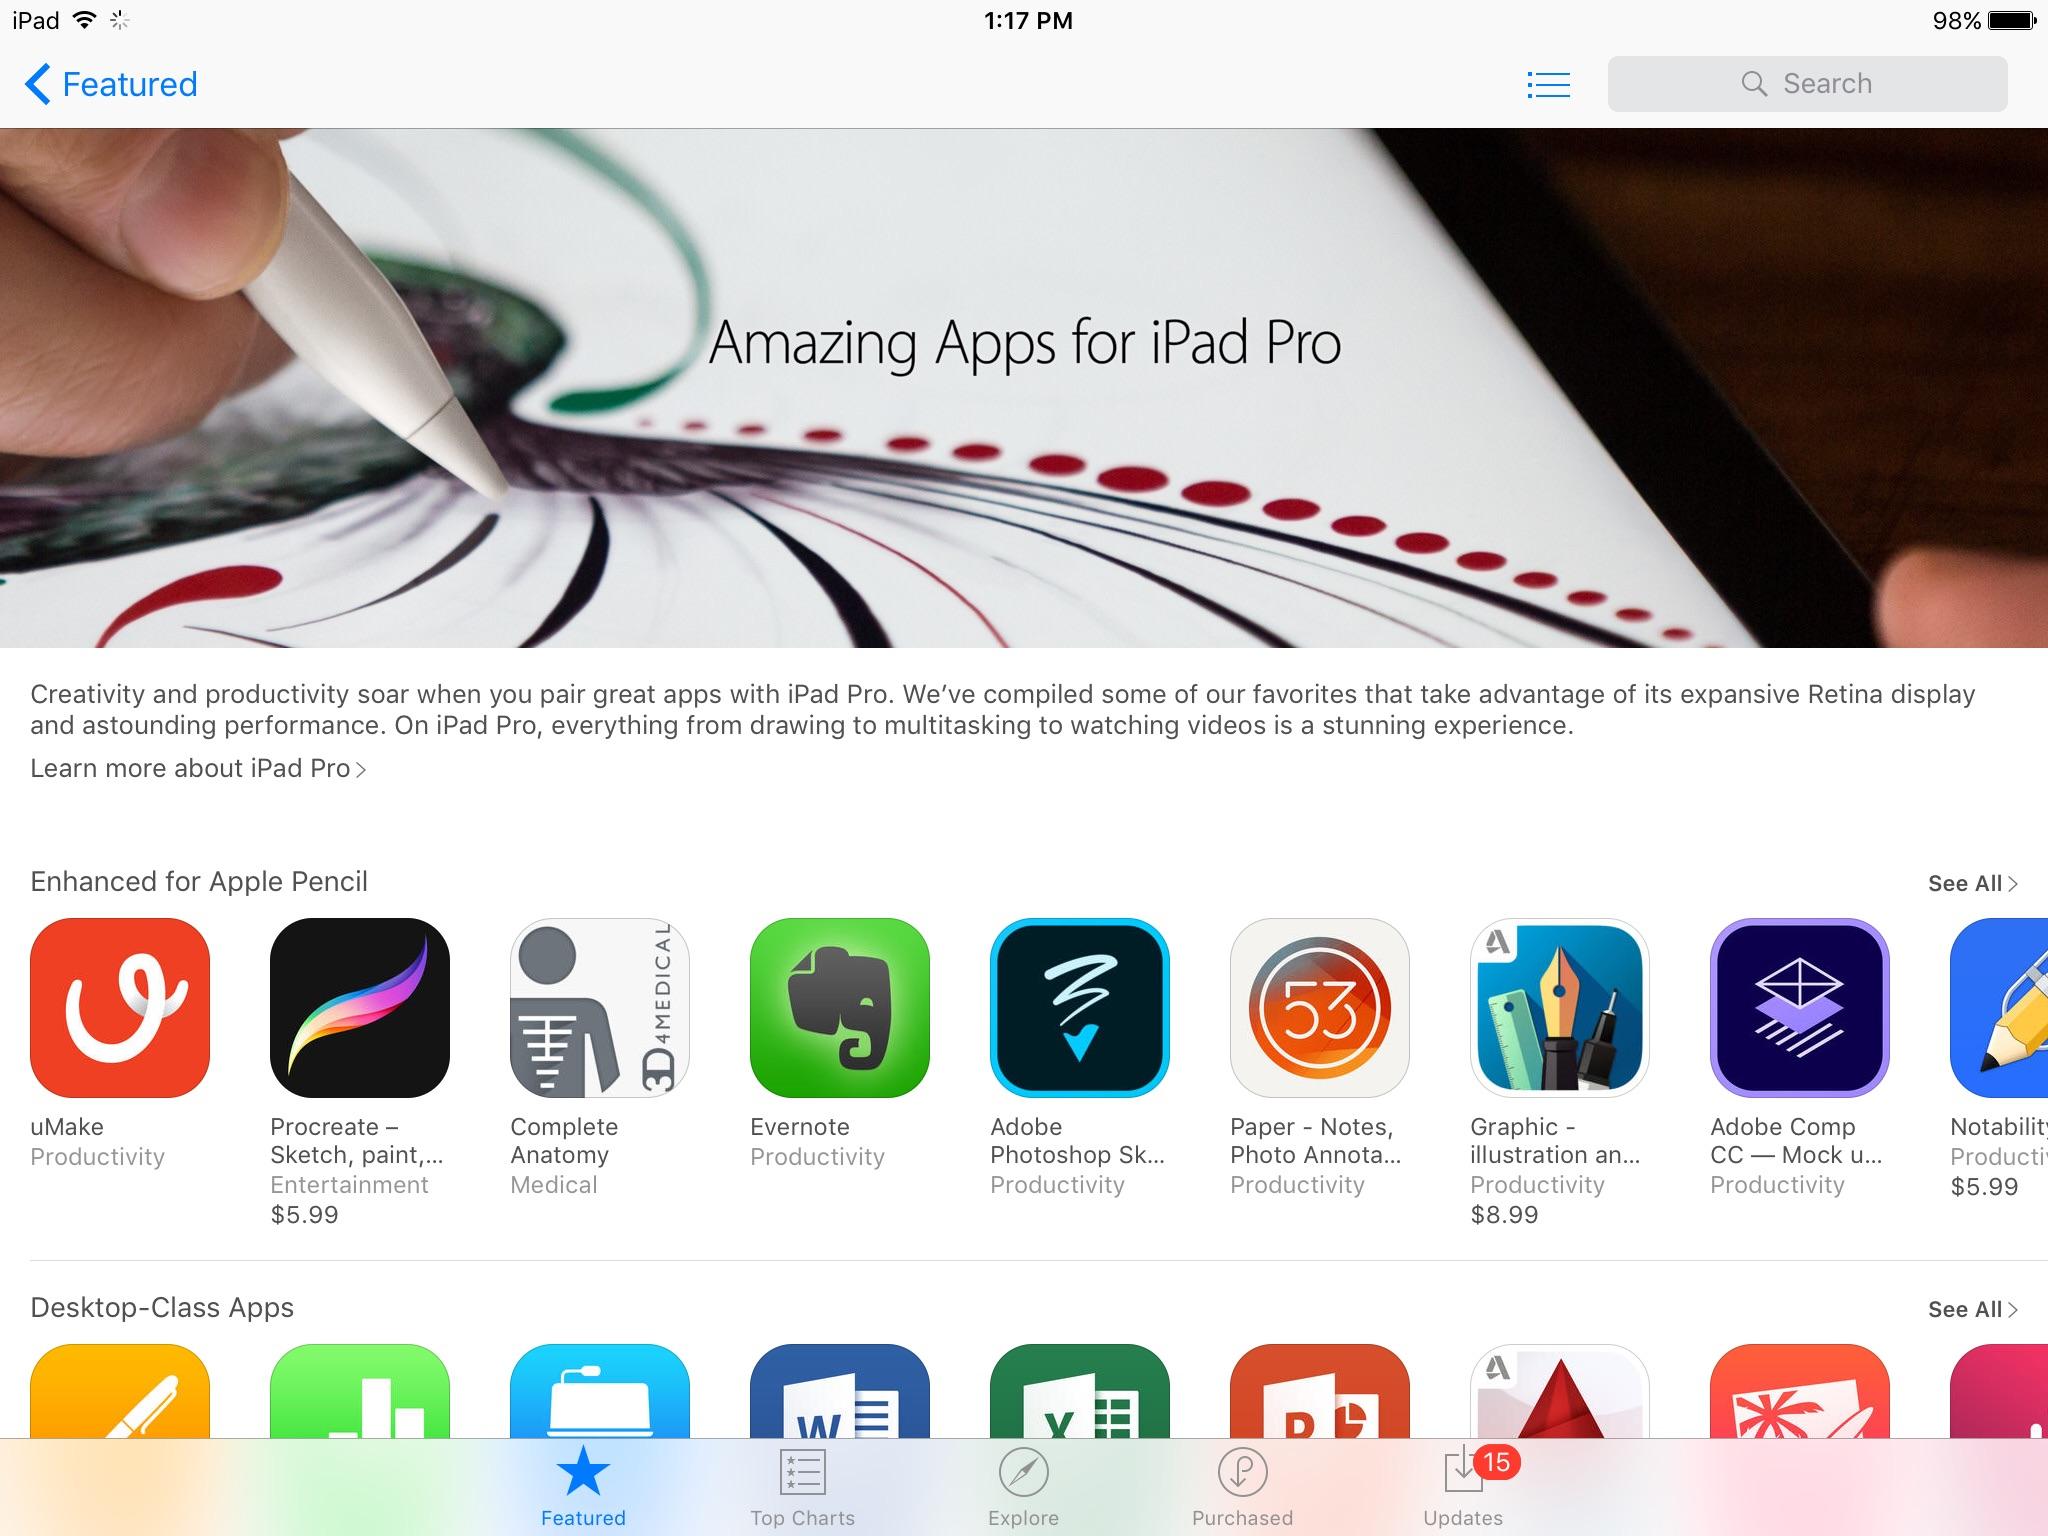 Amazing Apps for iPad Pro